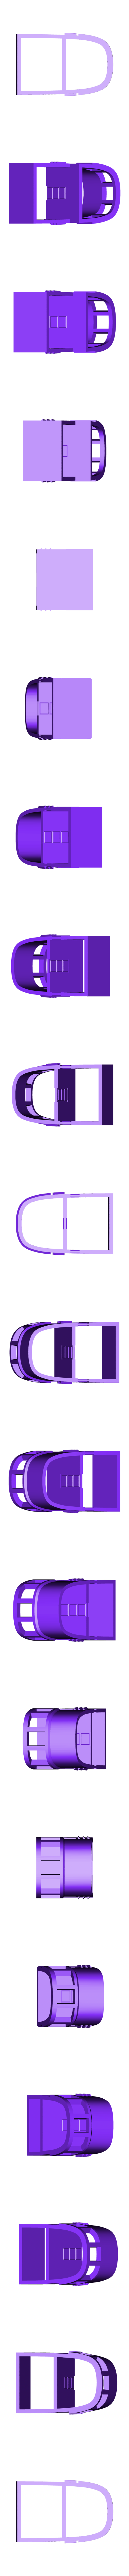 Tug_wheelhouse.stl Download free STL file Barge with Tugboat • 3D print object, Kajdalon